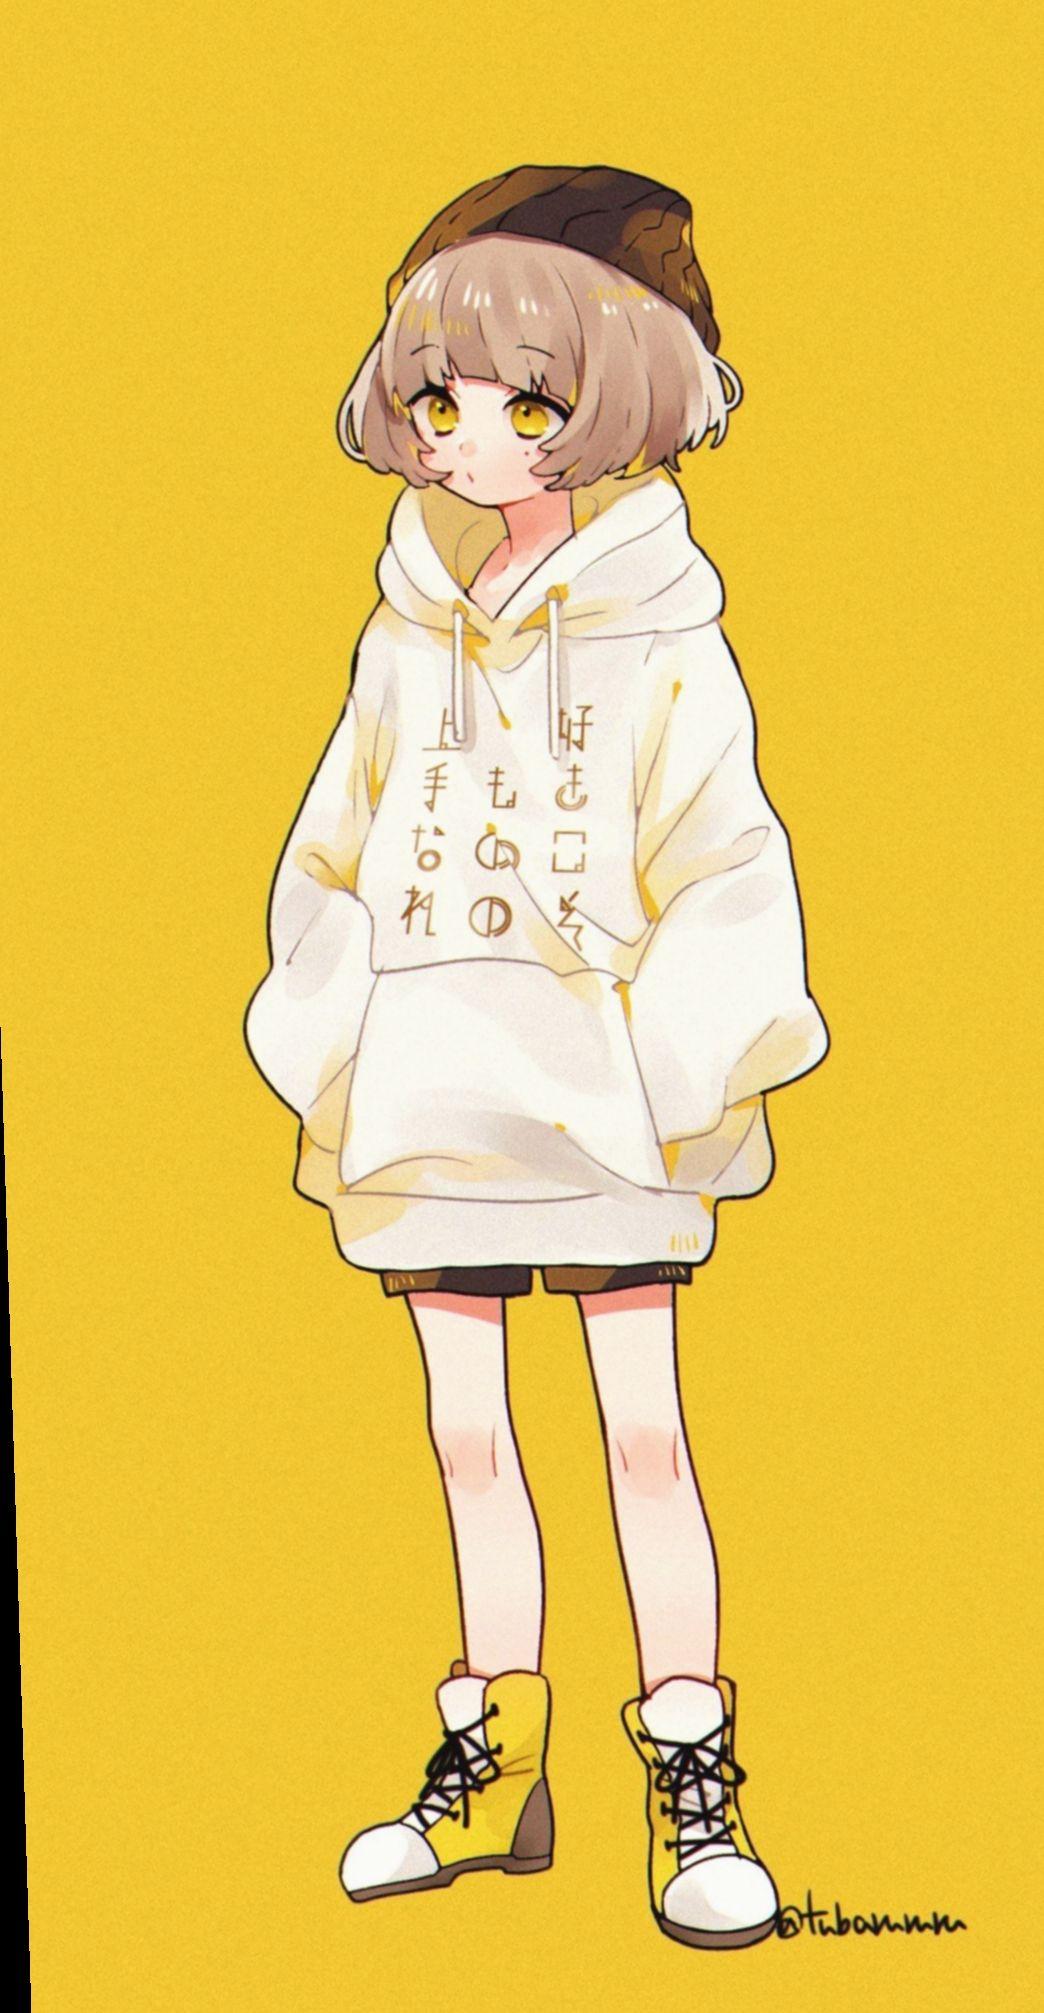 Anime Outfits Drawing Boy Animecosplay Mangacosplay Mha Cute Anime Character Anime Chibi Anime Art Girl